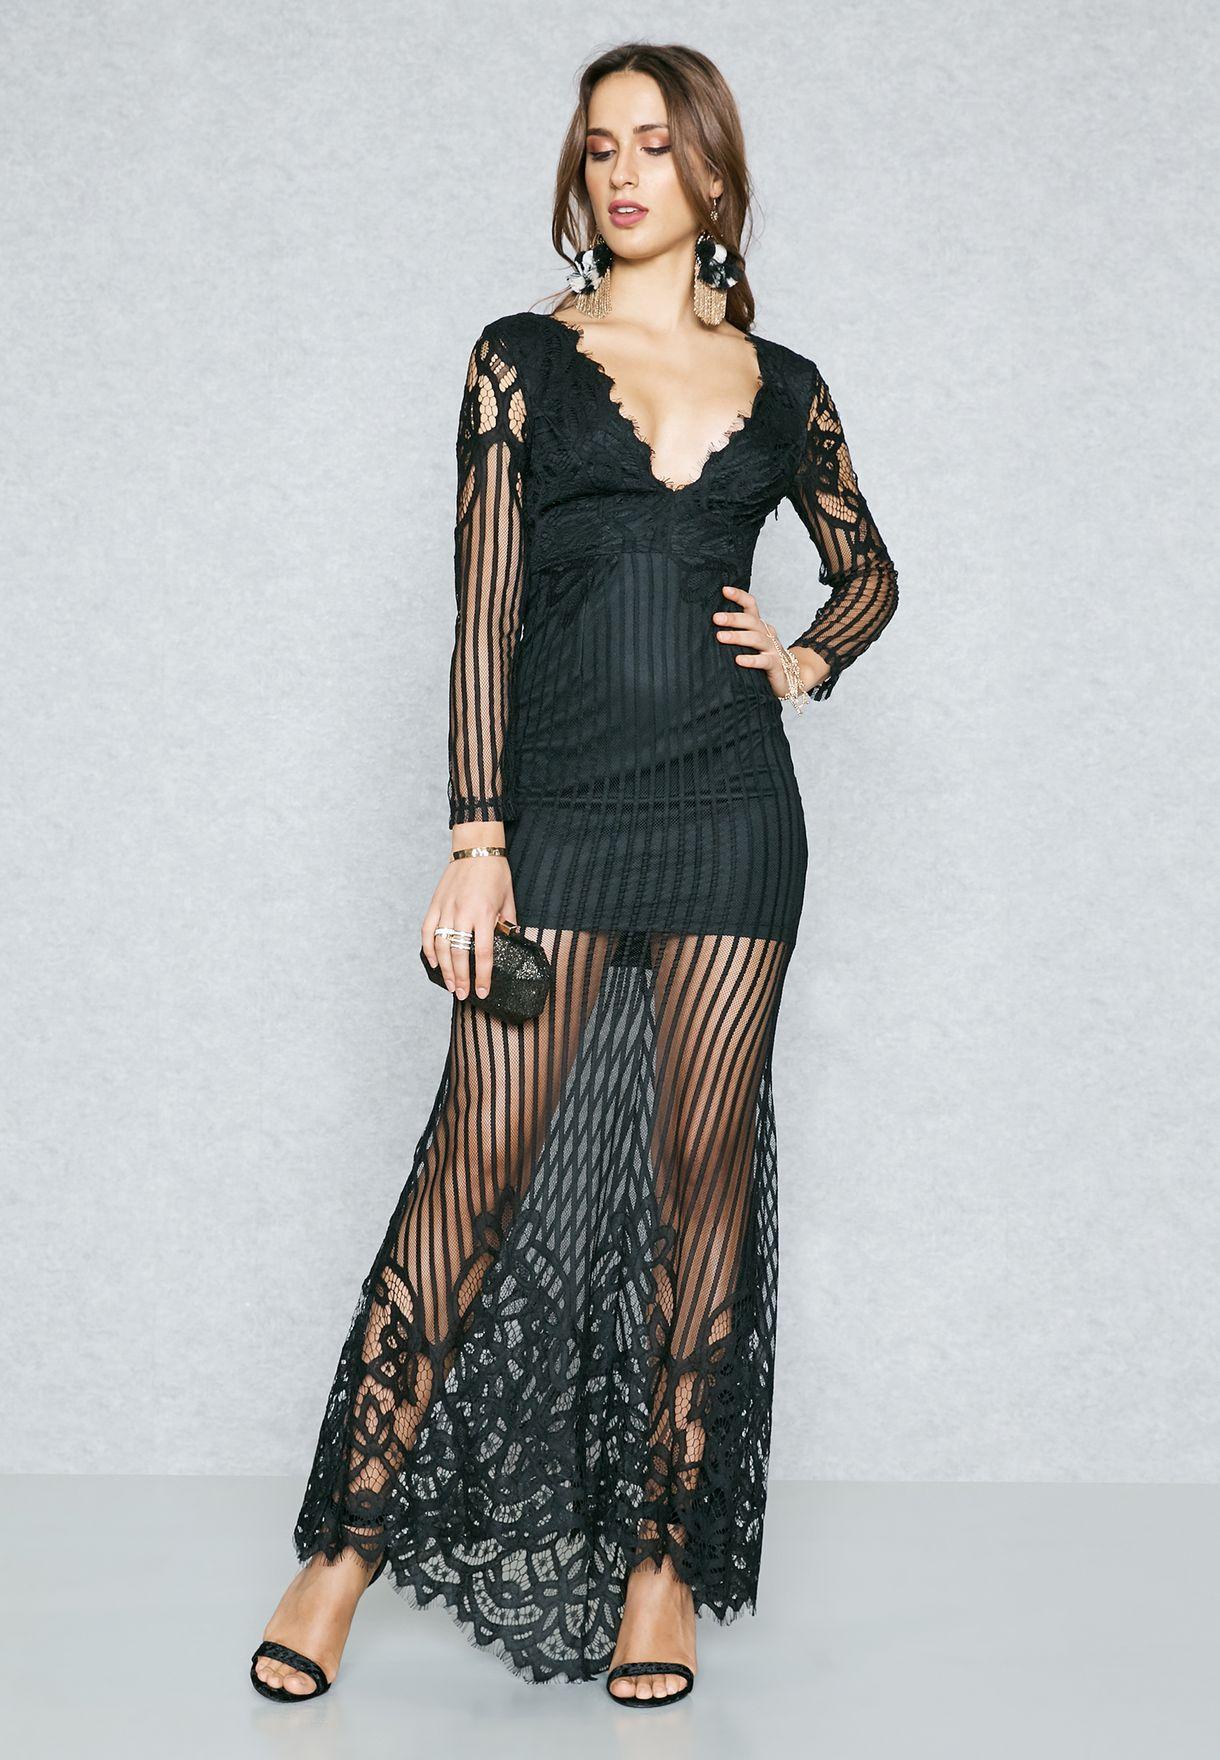 e1a244b75e1 Shop Ella Limited Edition black Open Back Lace Mesh Overlay Dress ...